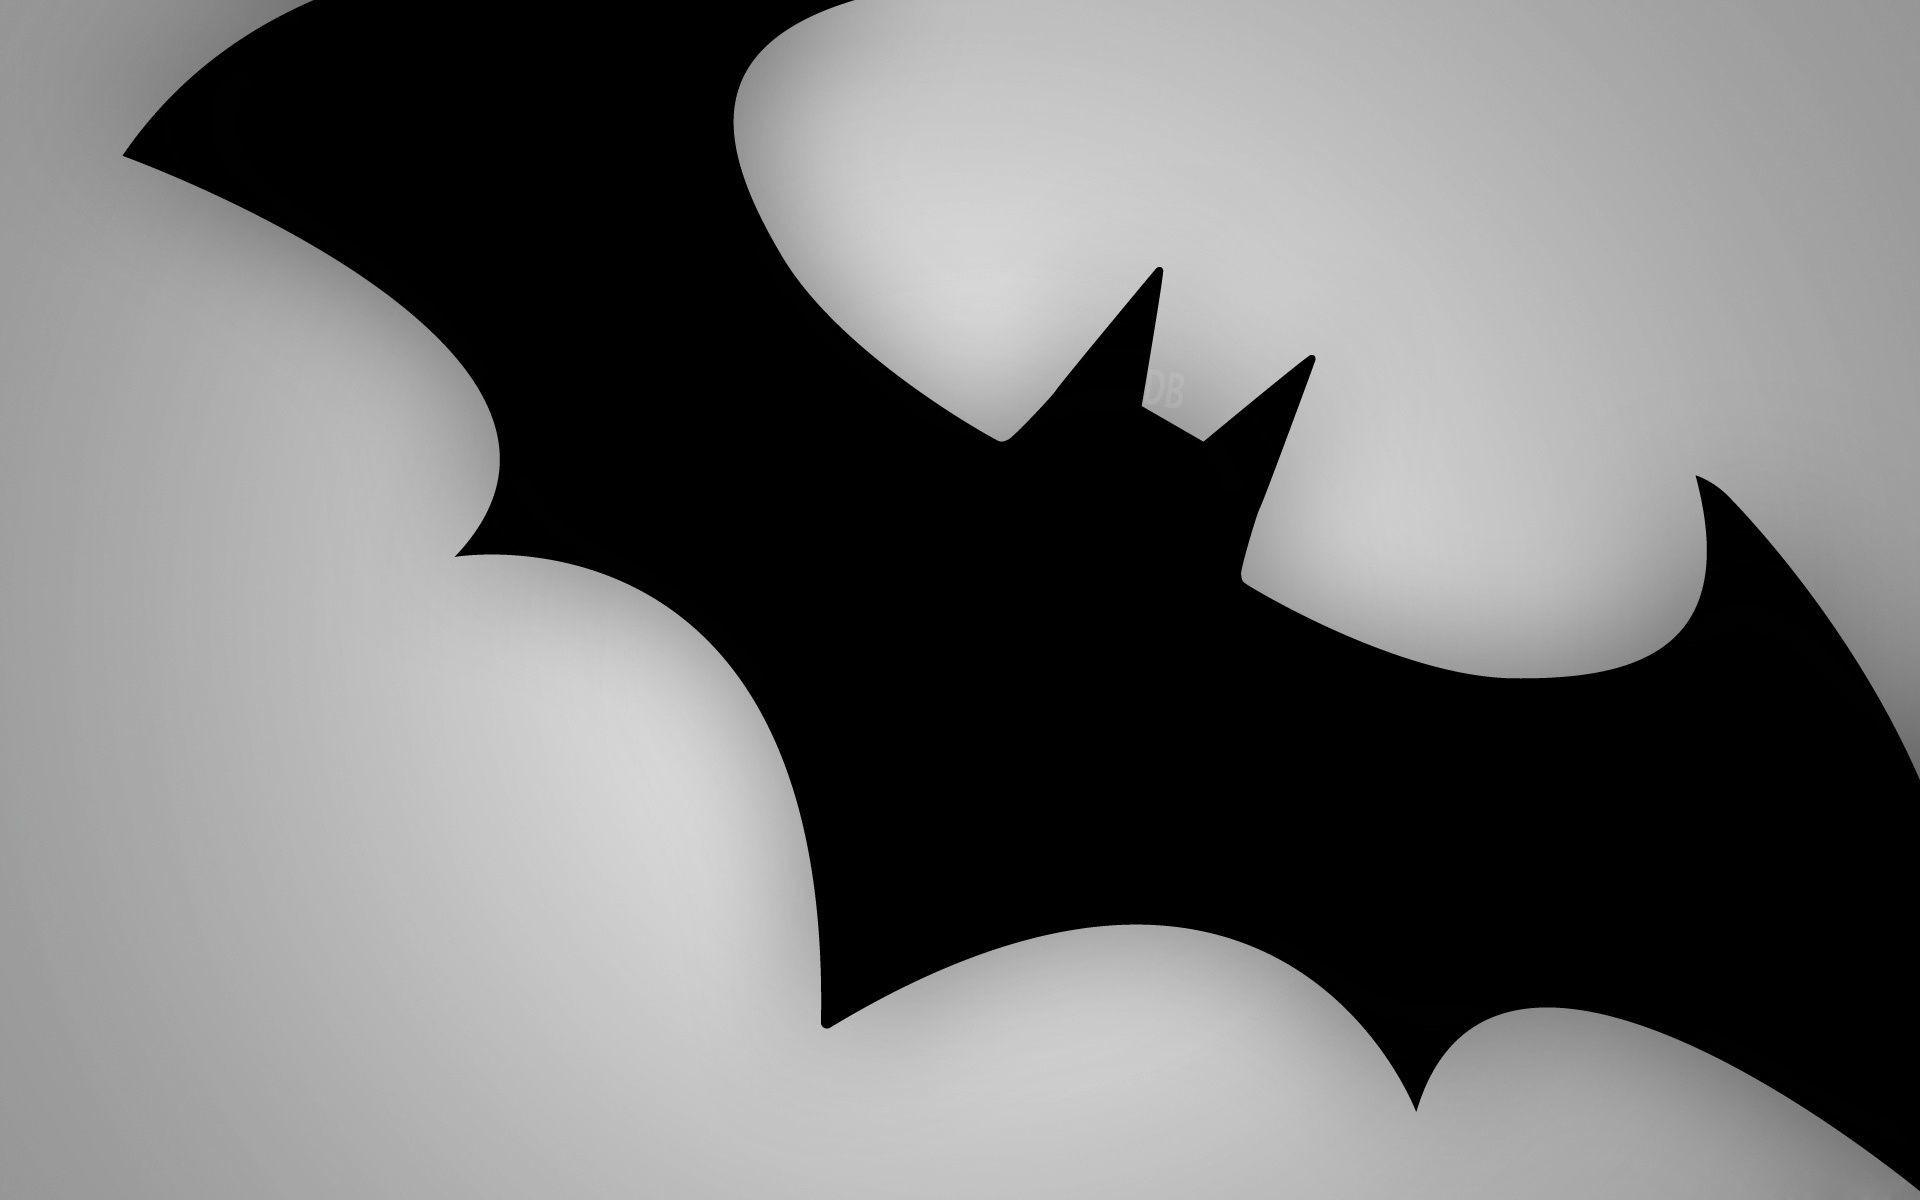 480×800 Modern Batman Logo Galaxy s2 wallpaper | Adorable Wallpapers |  Pinterest | Galaxy s2, Batman and Wallpaper